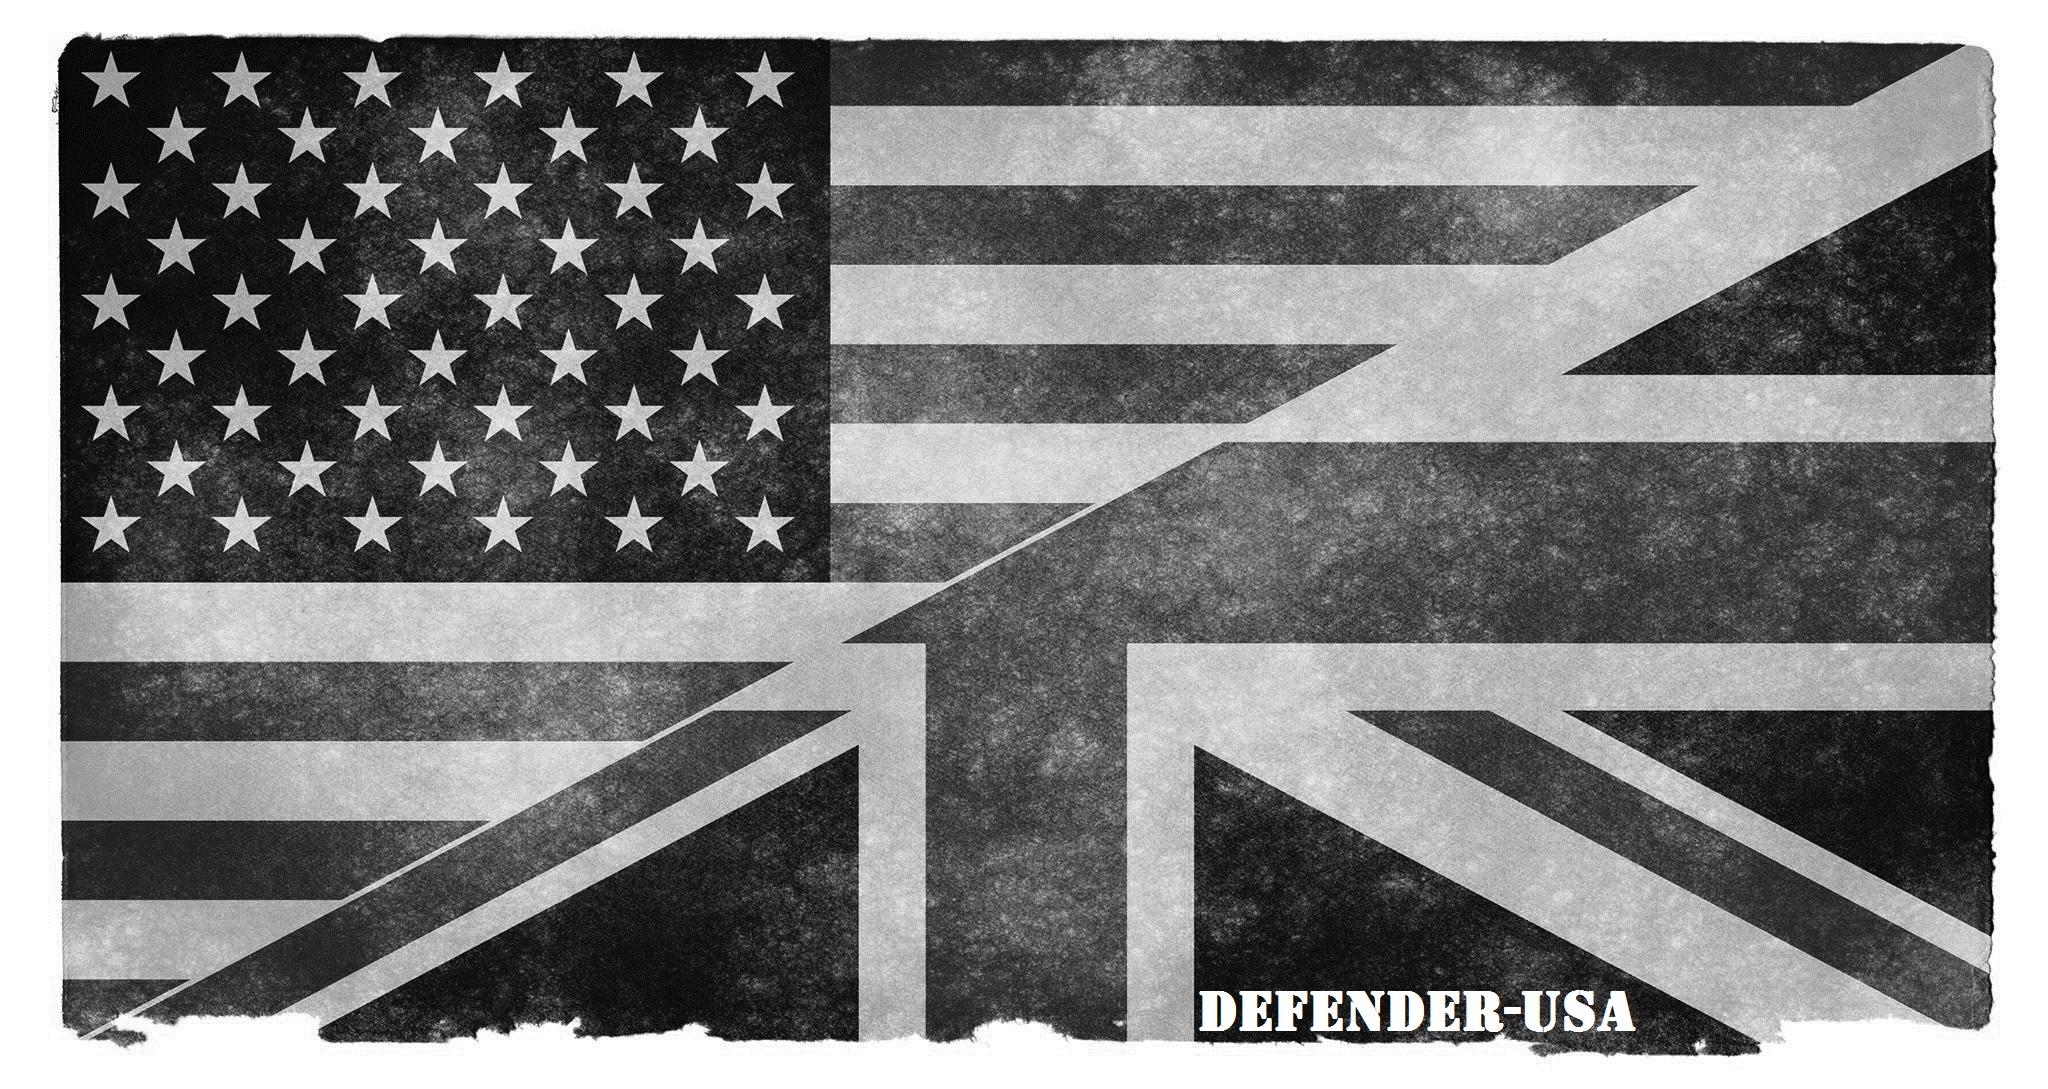 US/UK Flag (Black & White) Defender-USA Sticker - Defender-USA